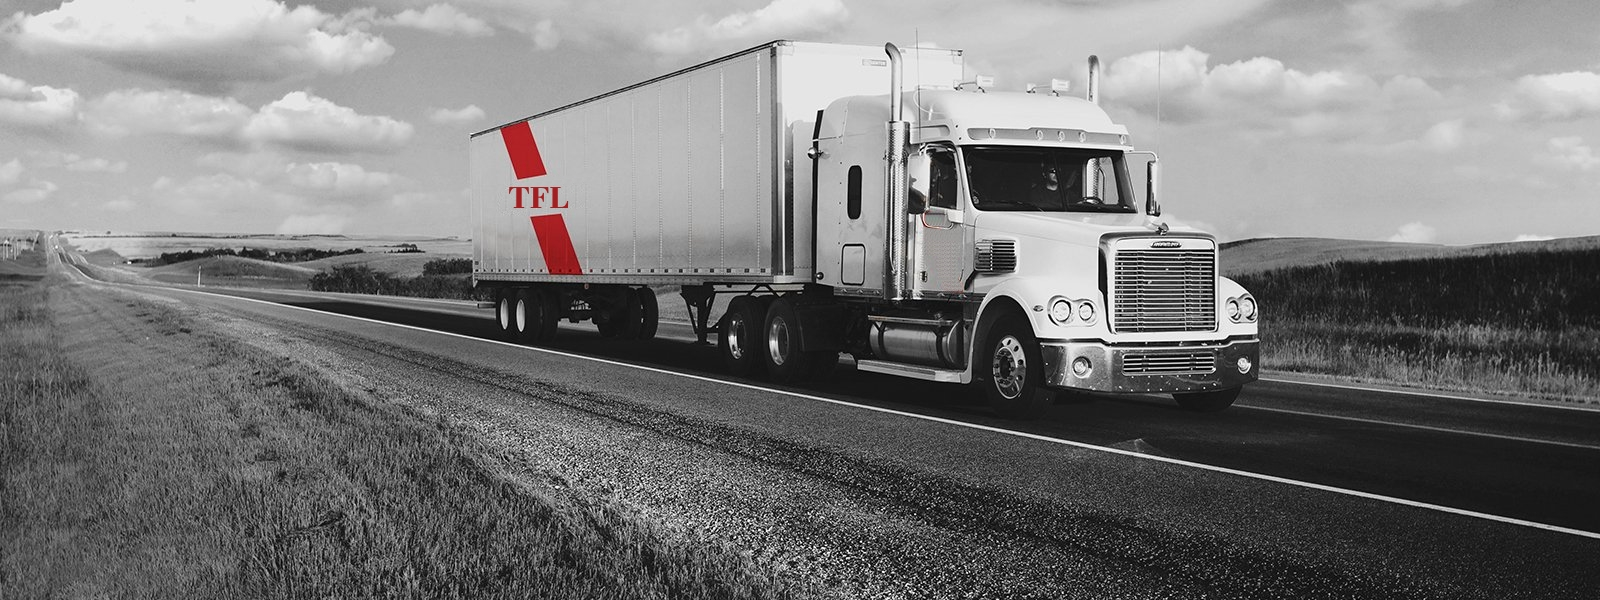 TFL- Empresa de carga de mercancía